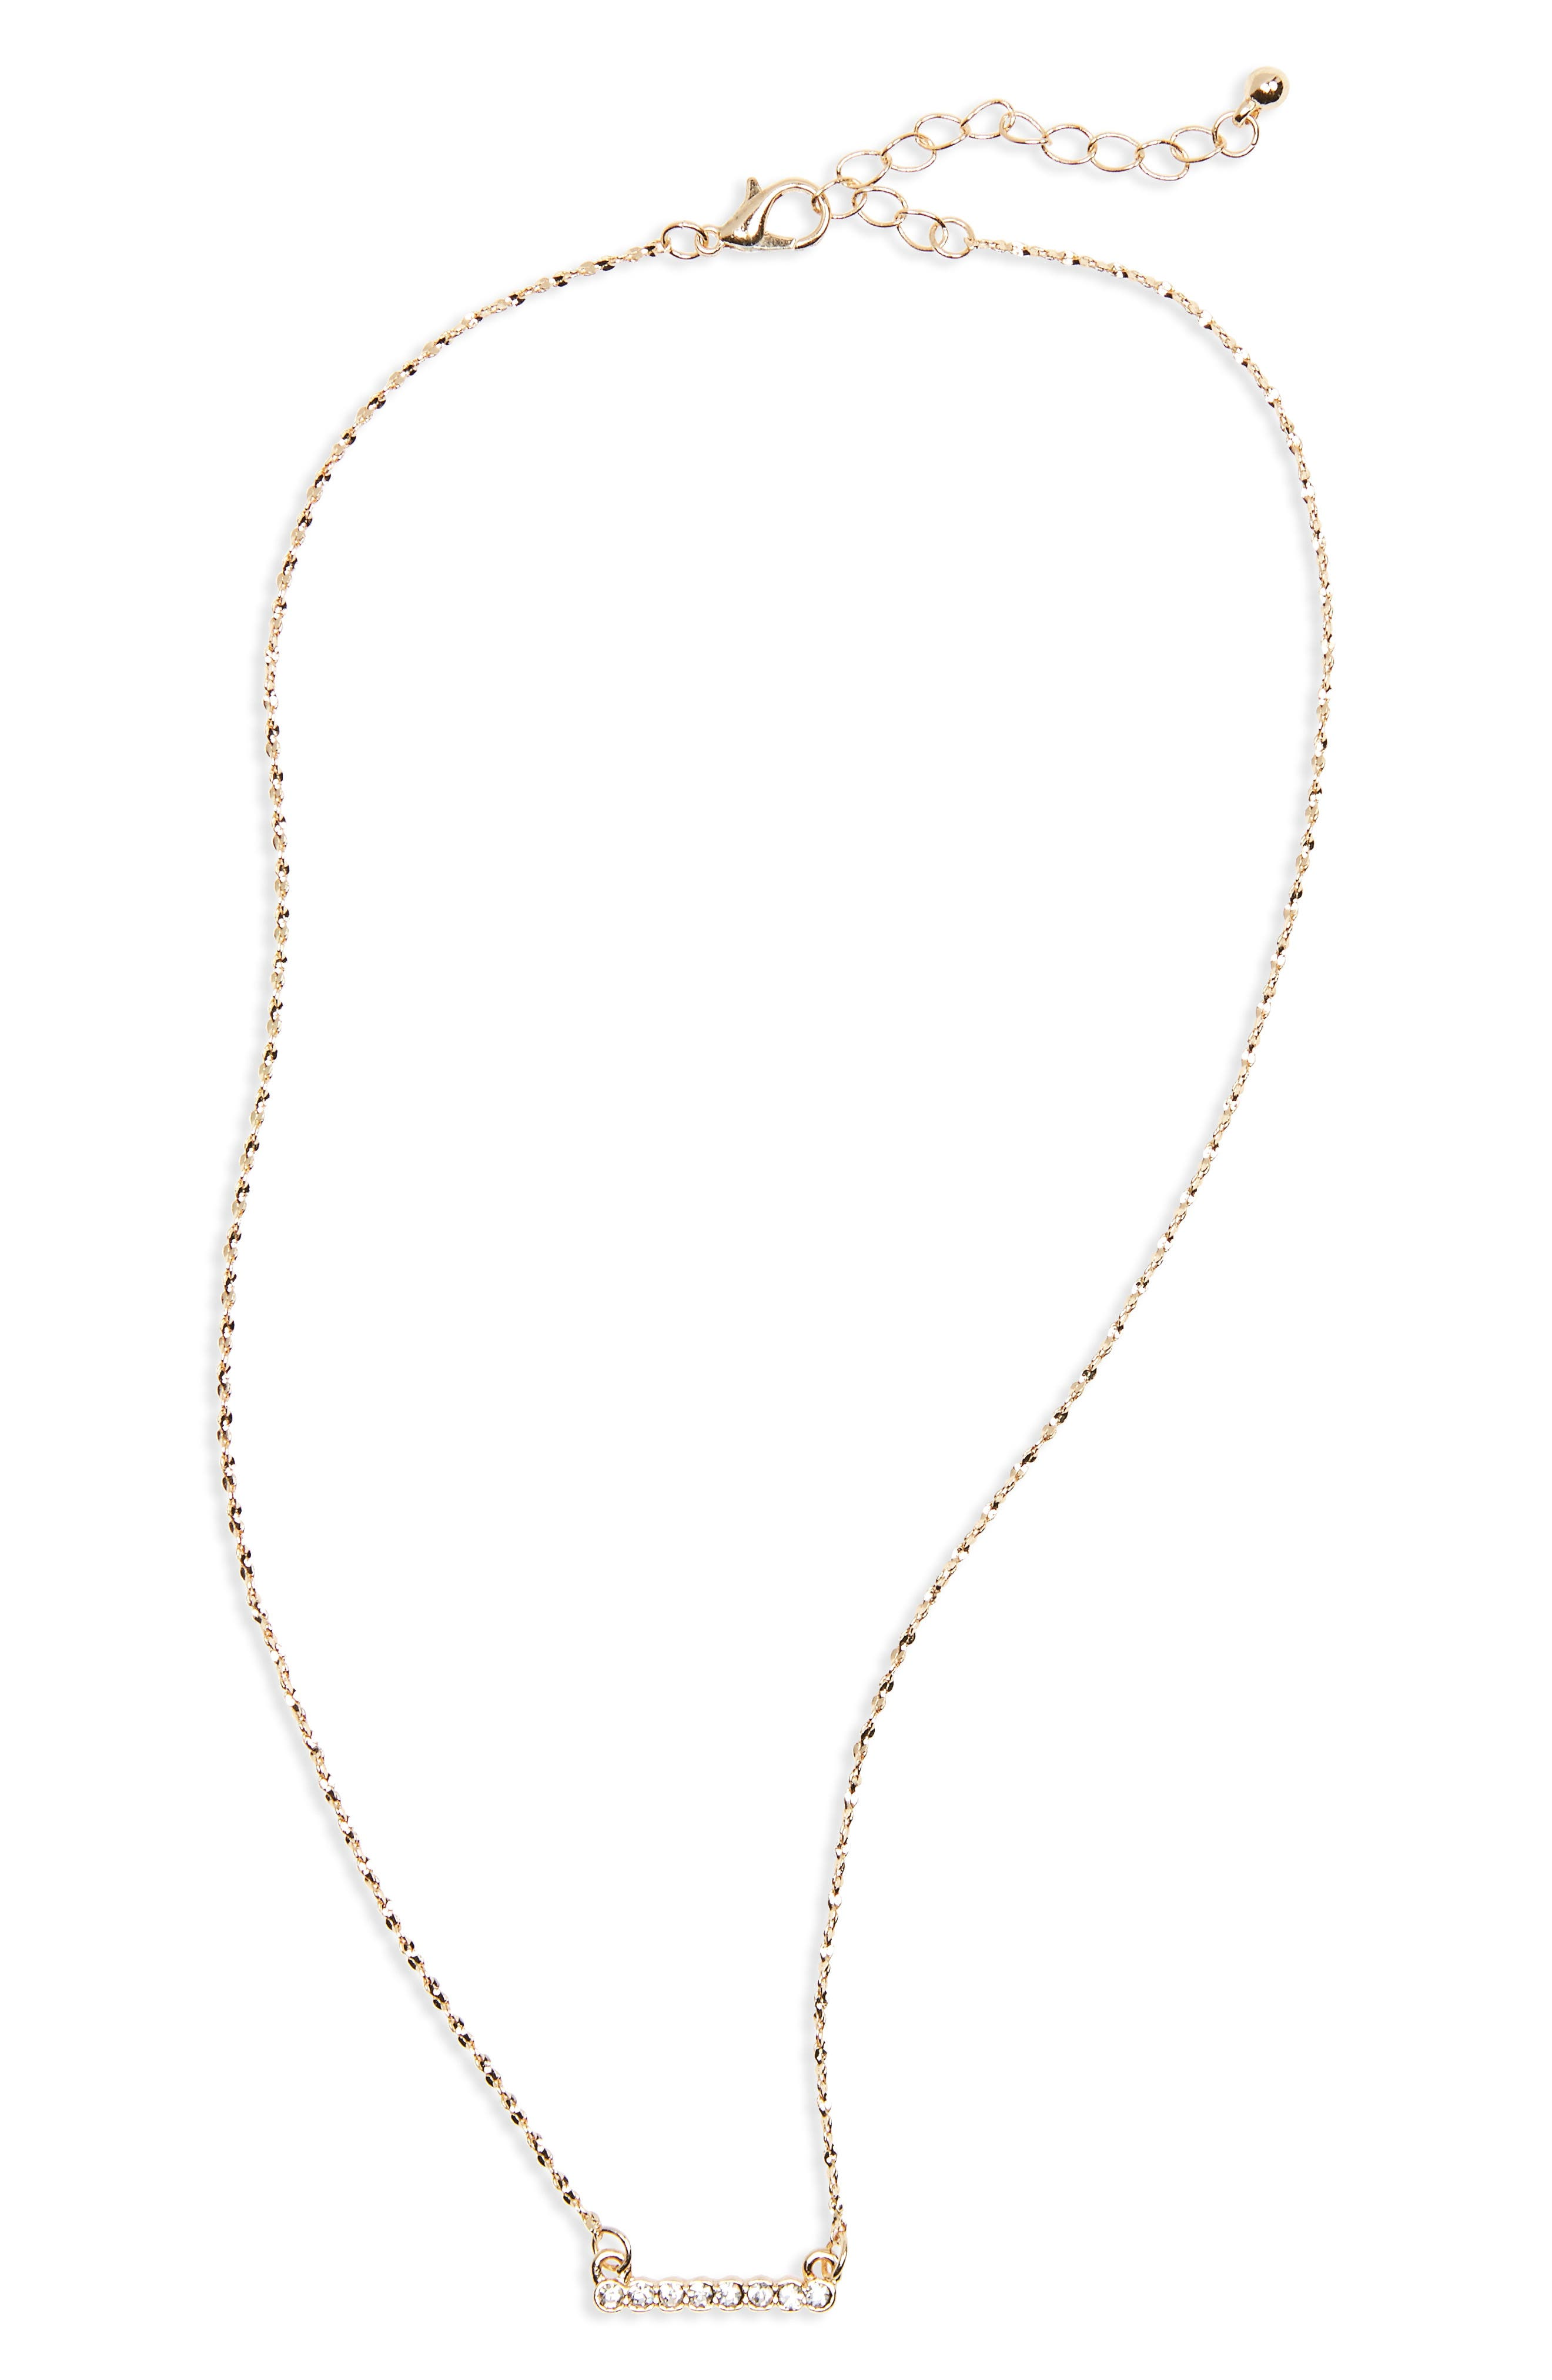 Dainty Crystal Bar Necklace,                             Main thumbnail 1, color,                             710